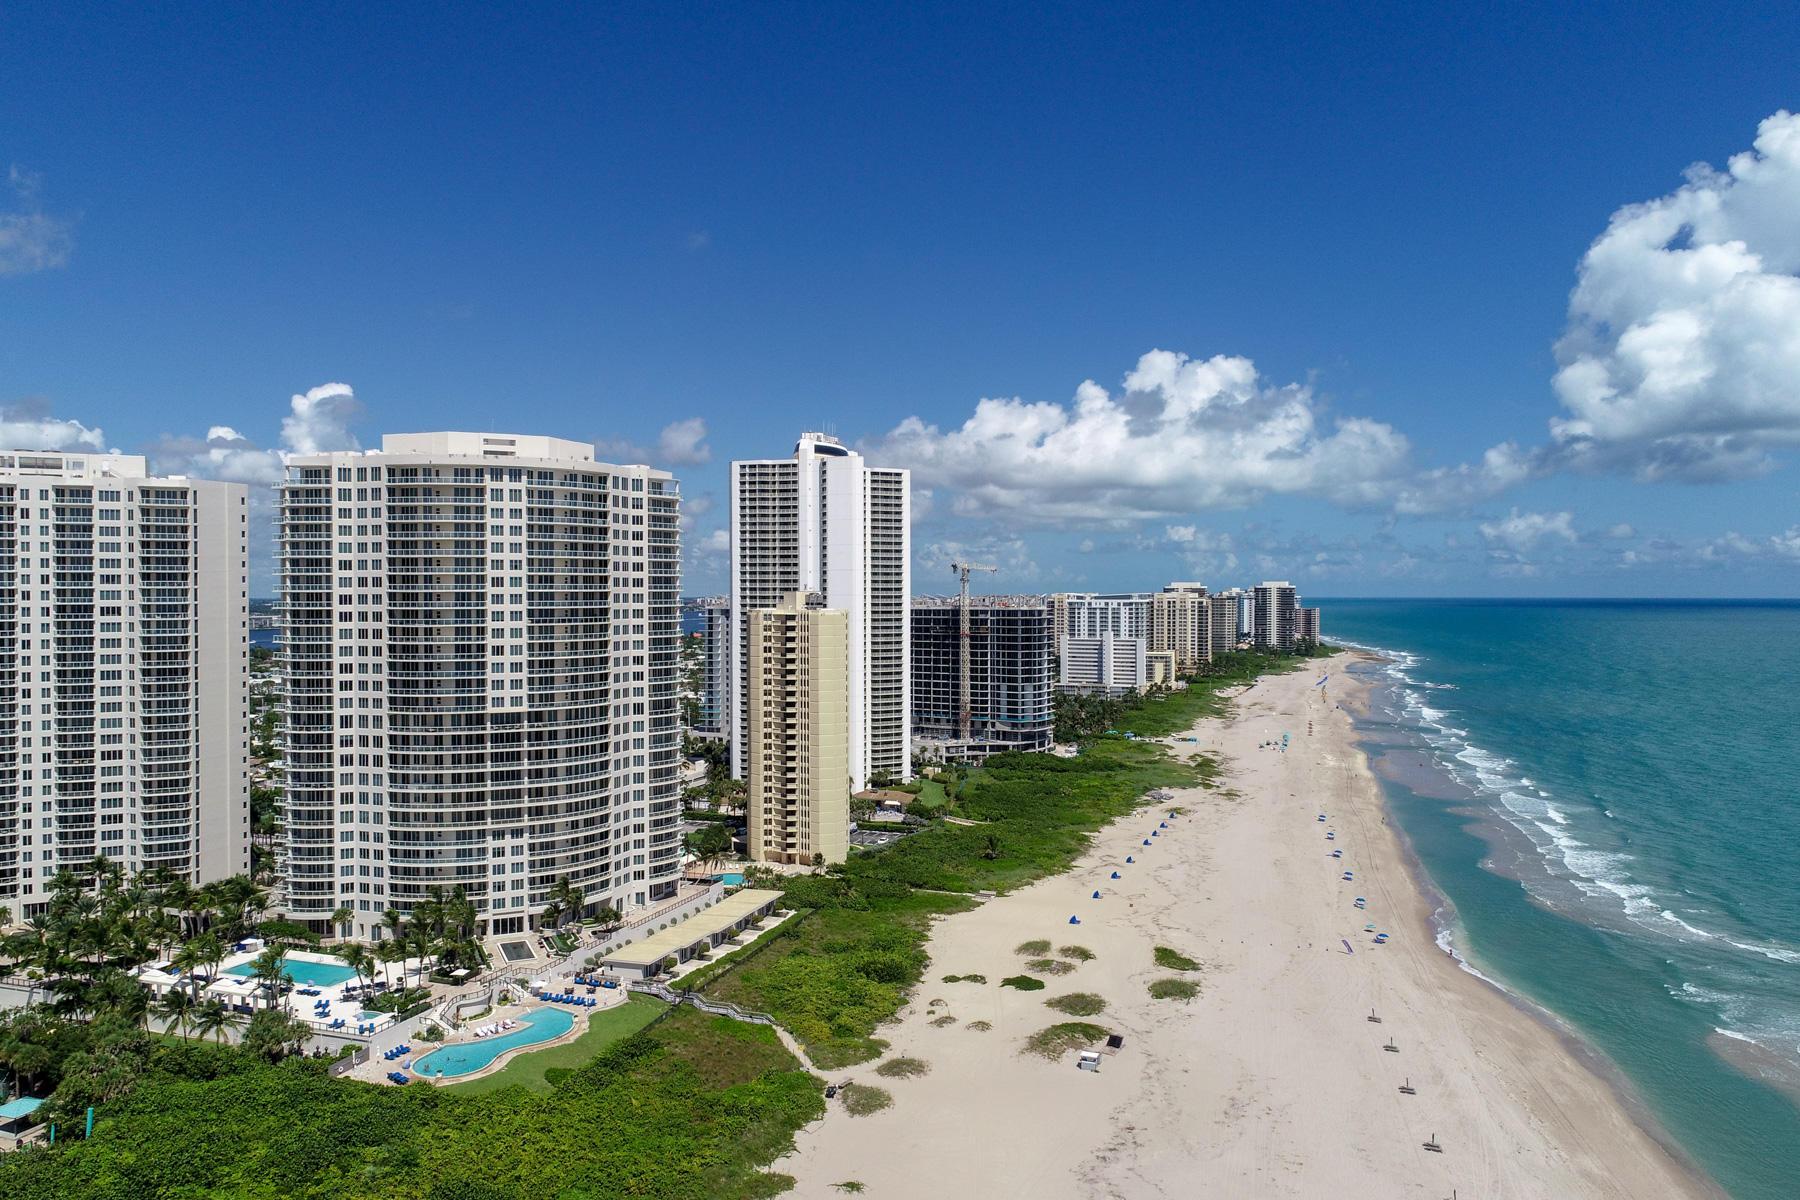 2700 NORTH OCEAN SINGER ISLAND FLORIDA